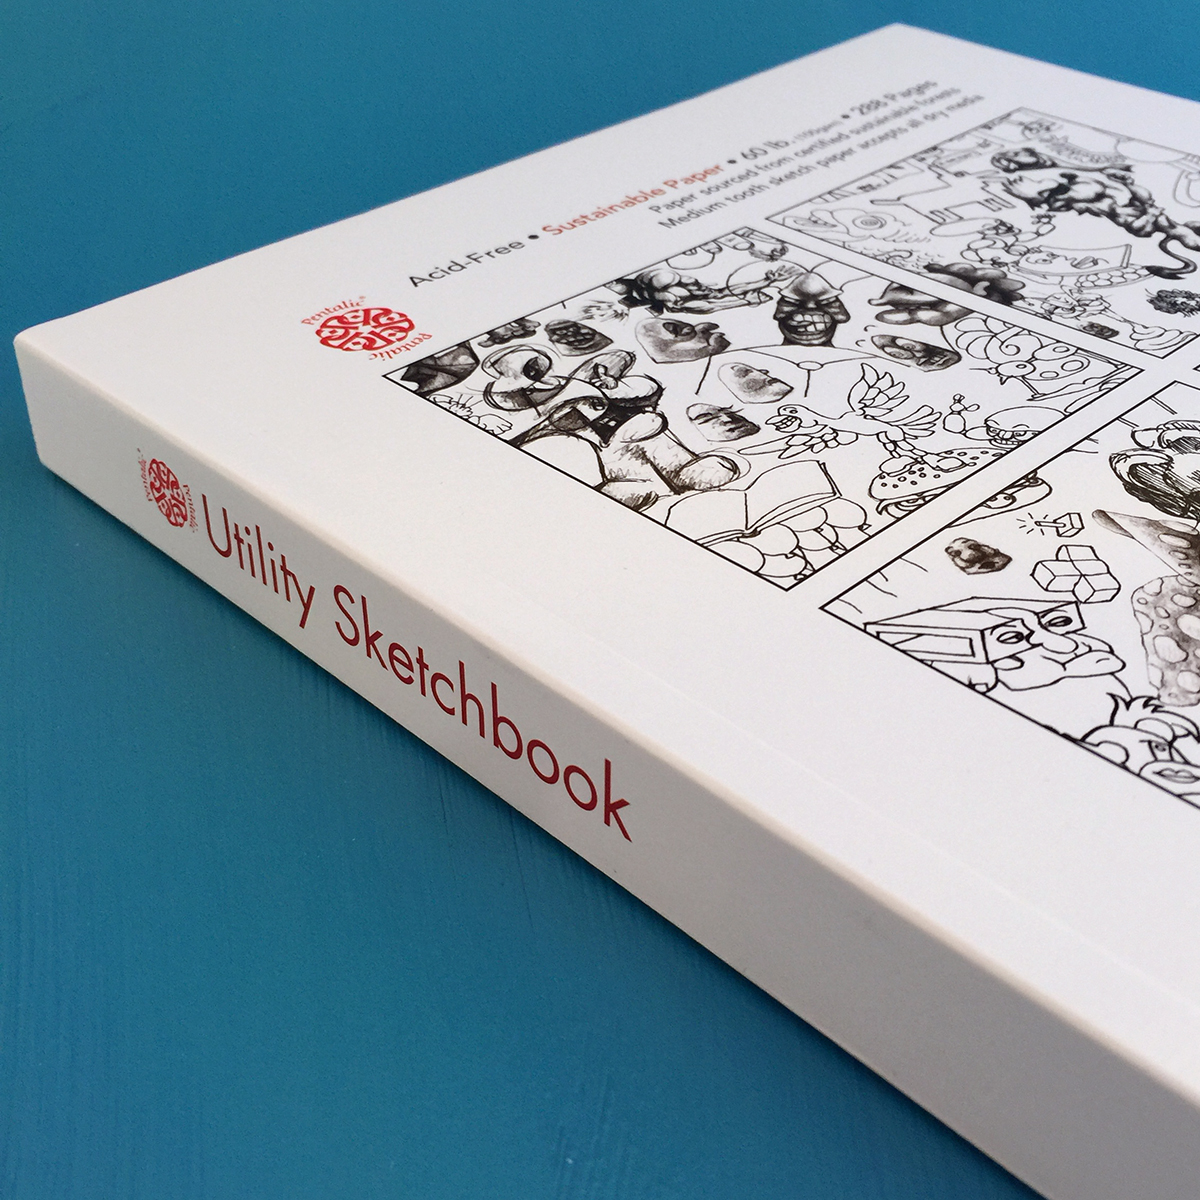 utilitysketchbook-cu